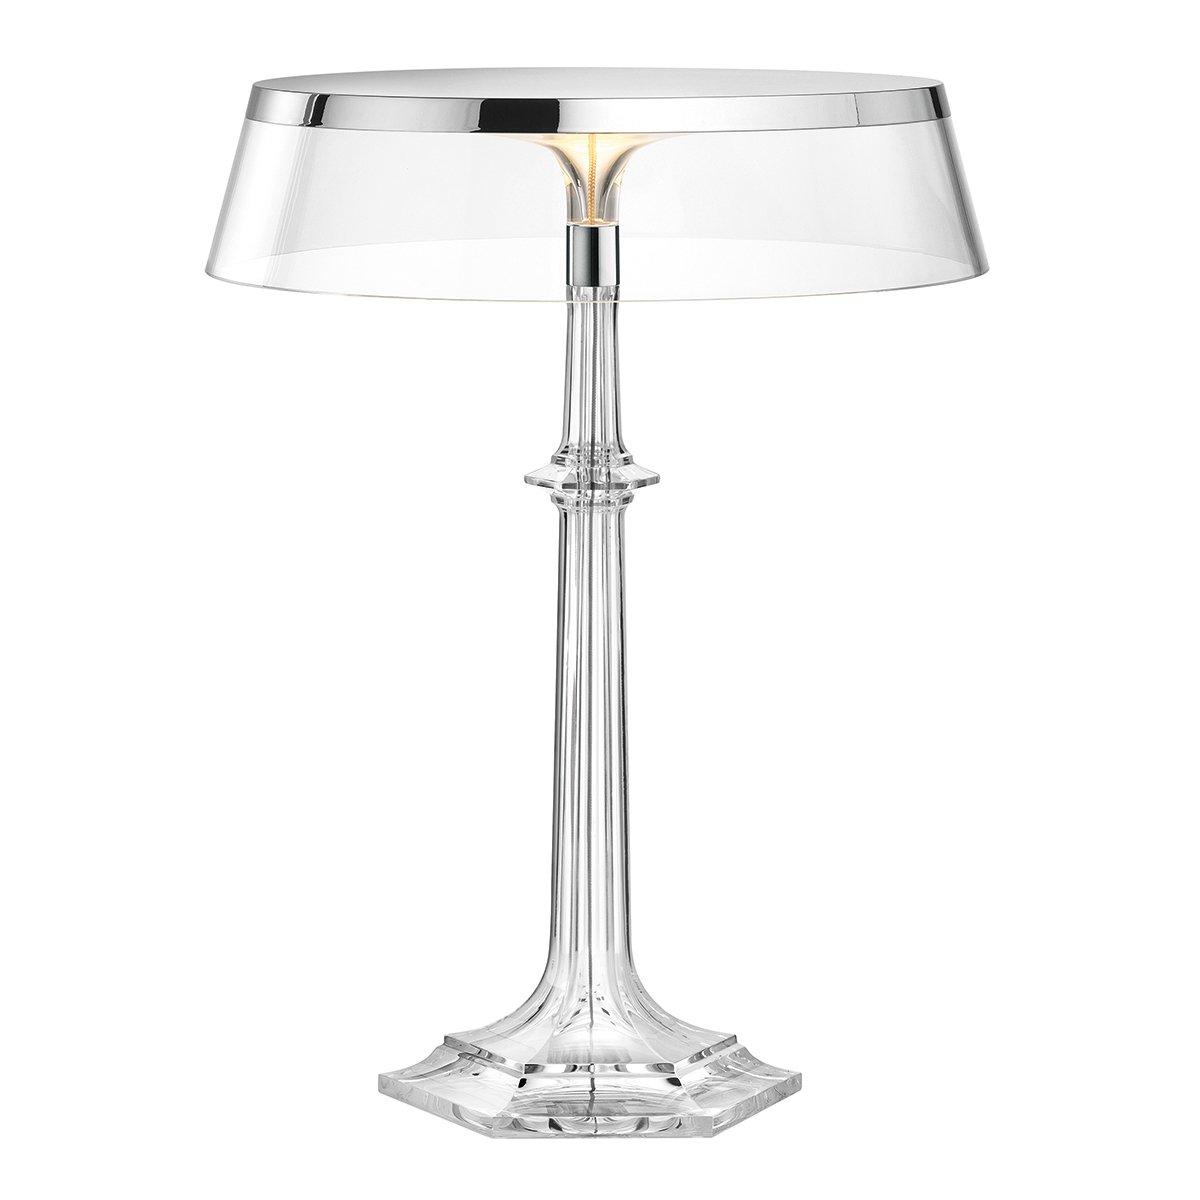 FLOS Bon Jour Versailles Tafellamp - Chroom - Transparant